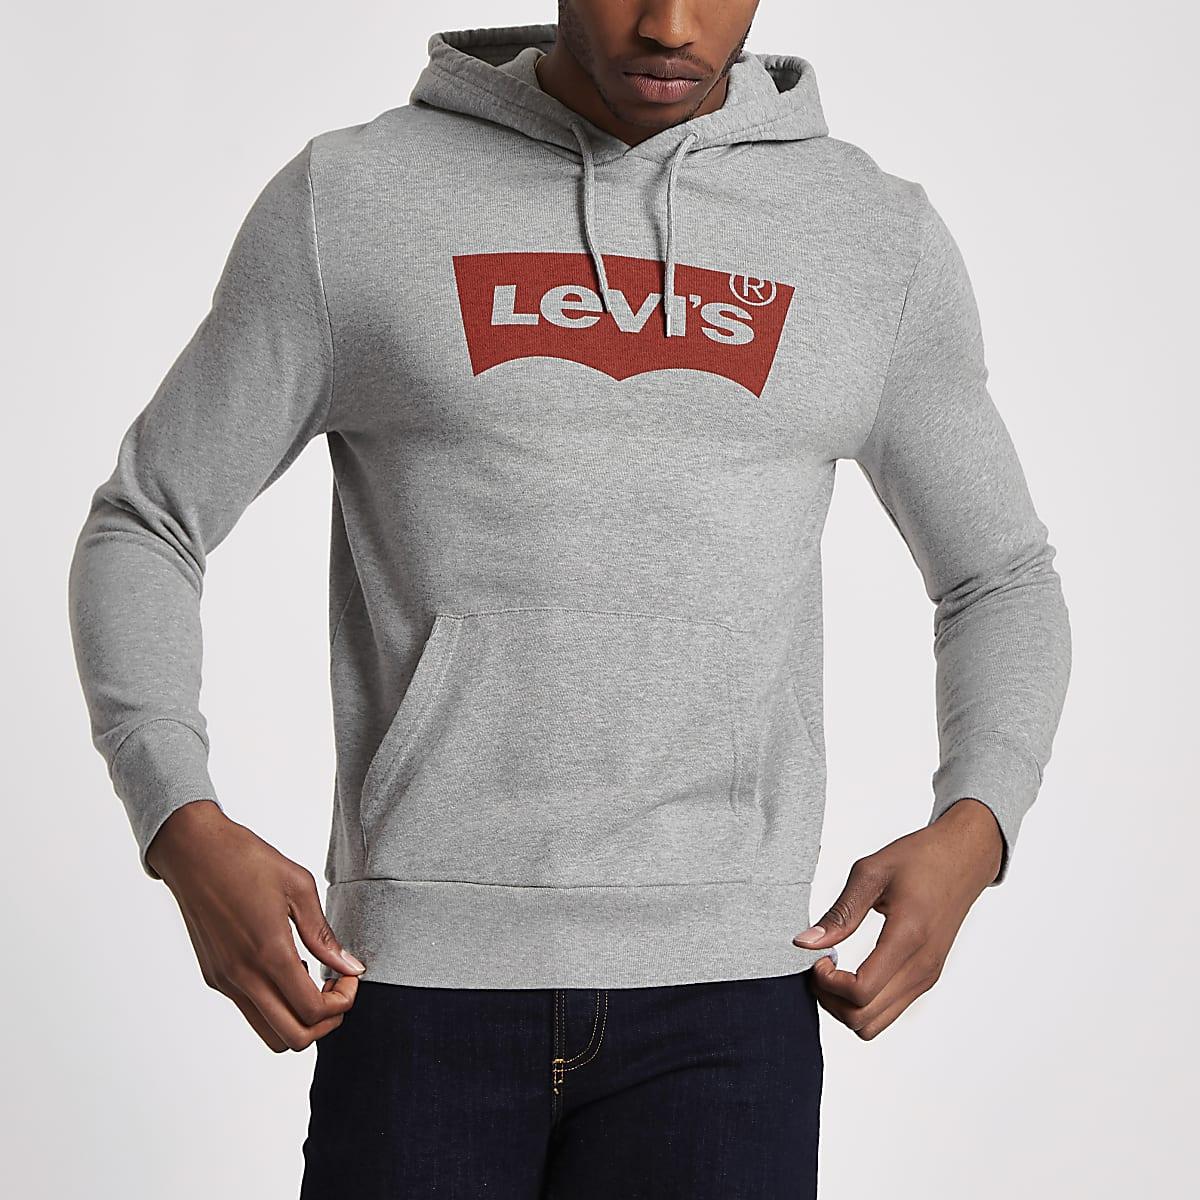 Levi's grey logo print hoodie